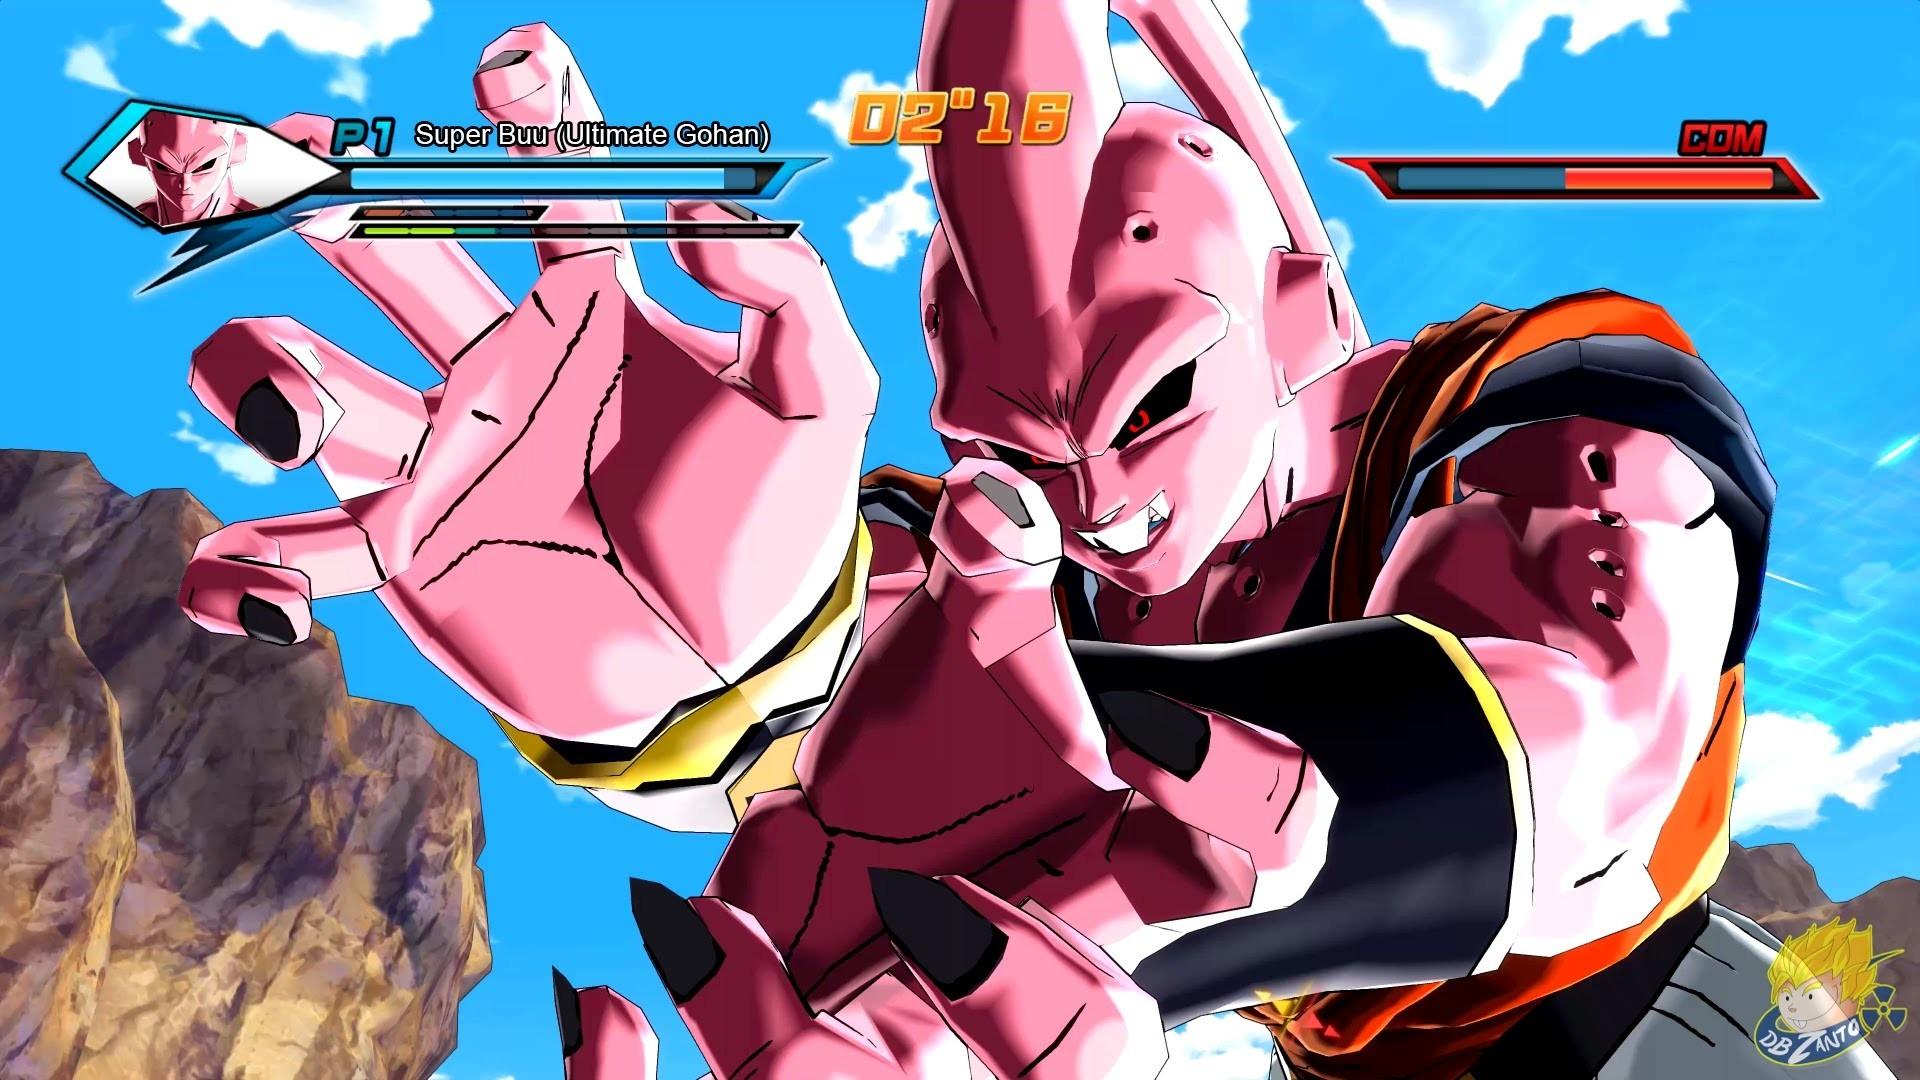 Res: 1920x1080, Dragon Ball Xenoverse (PC): Super Buu (Ultimate Gohan) Vs Vegito  [MOD]【60FPS 1080P】 - YouTube